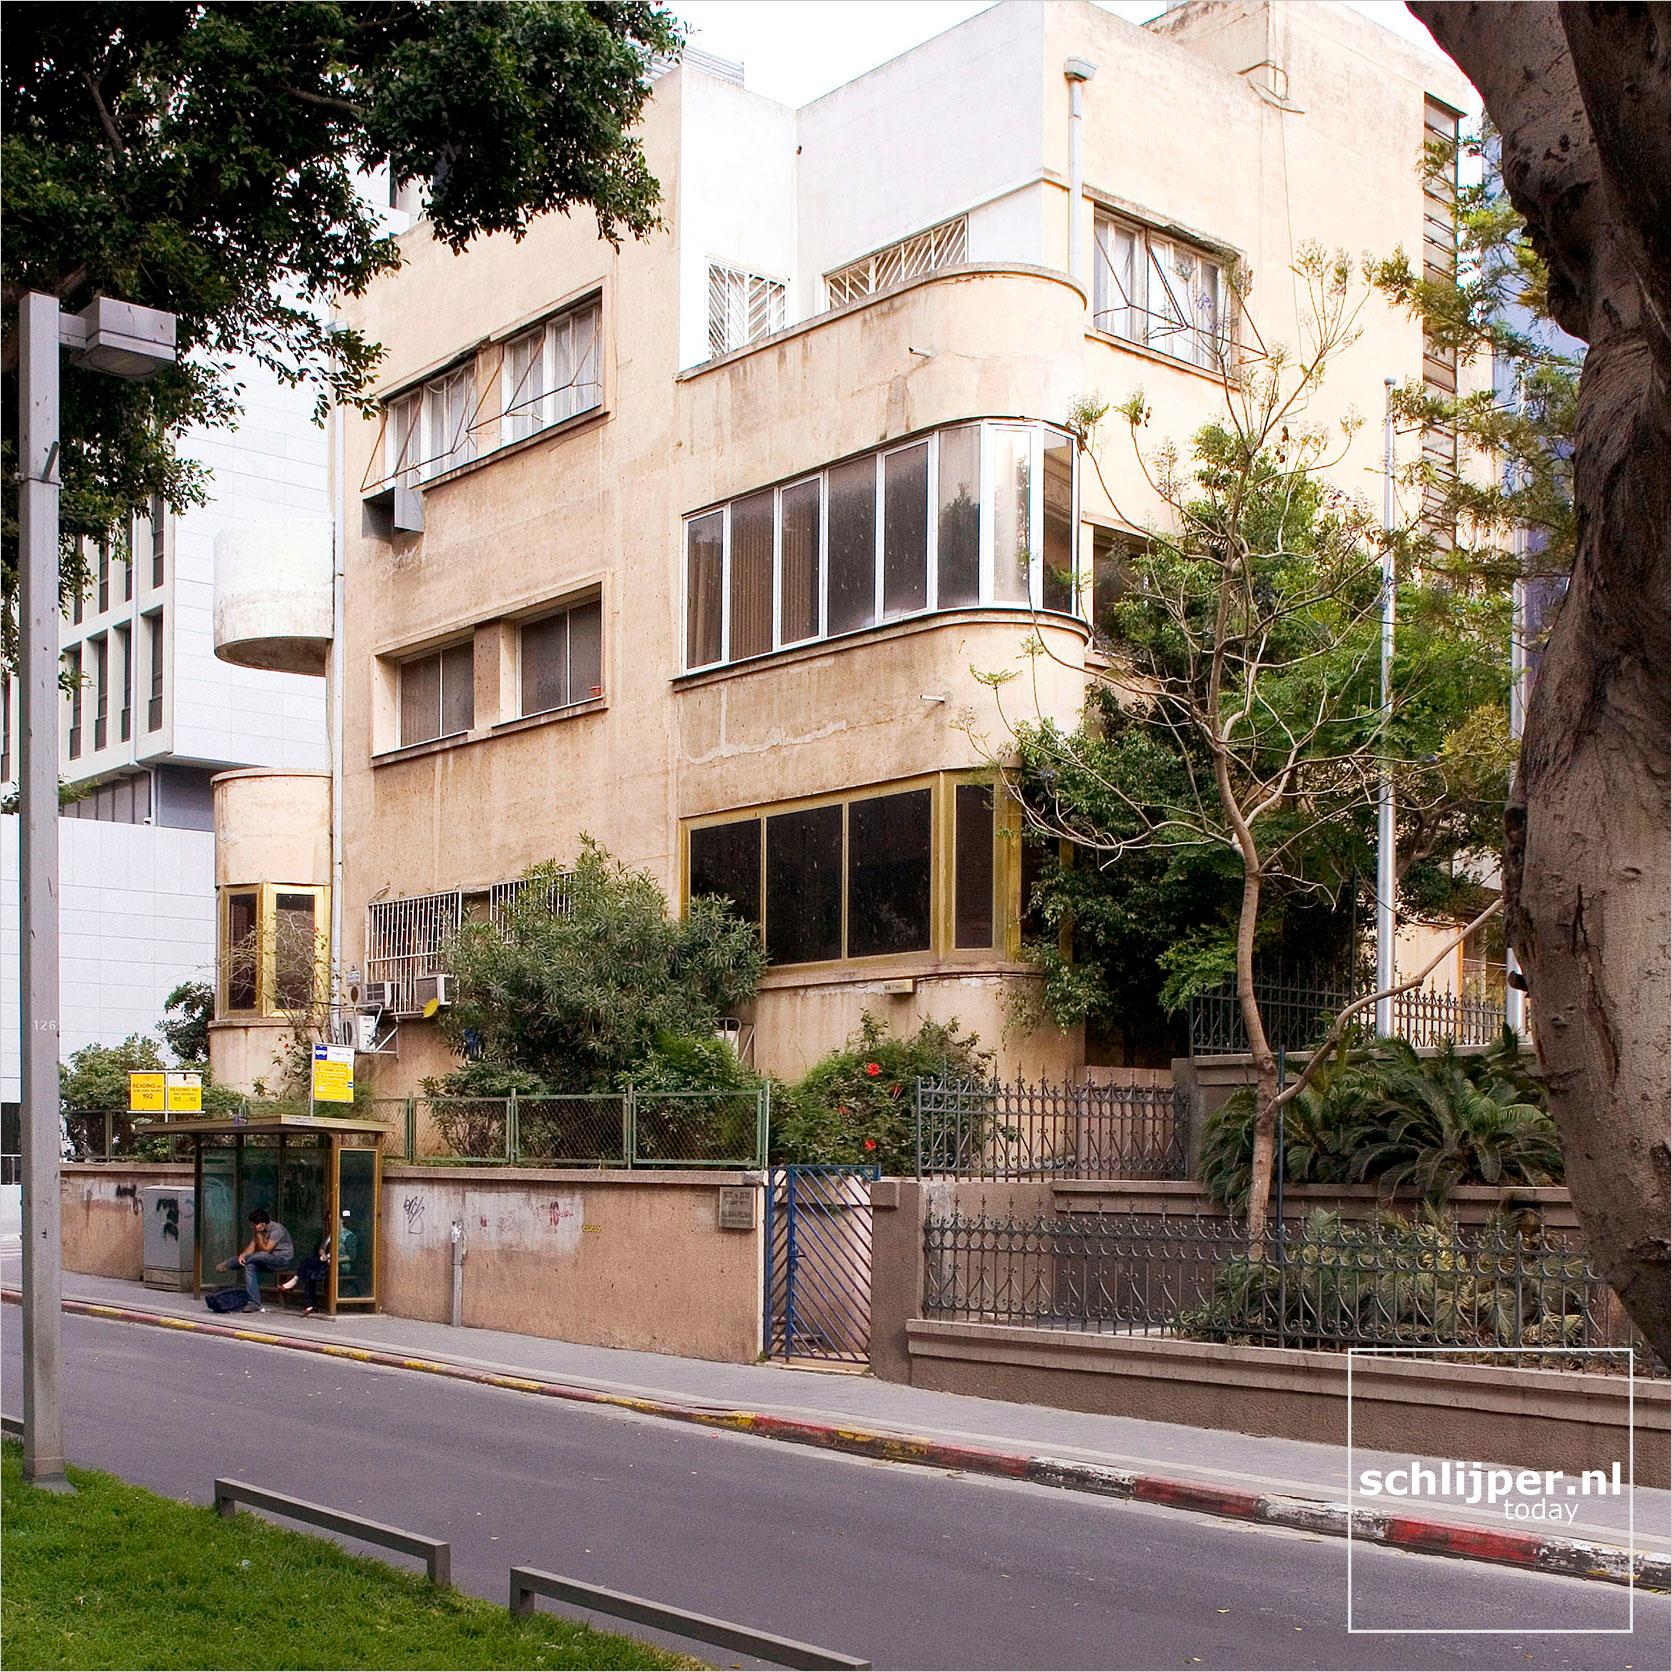 Israel, Tel Aviv, 22 april 2005